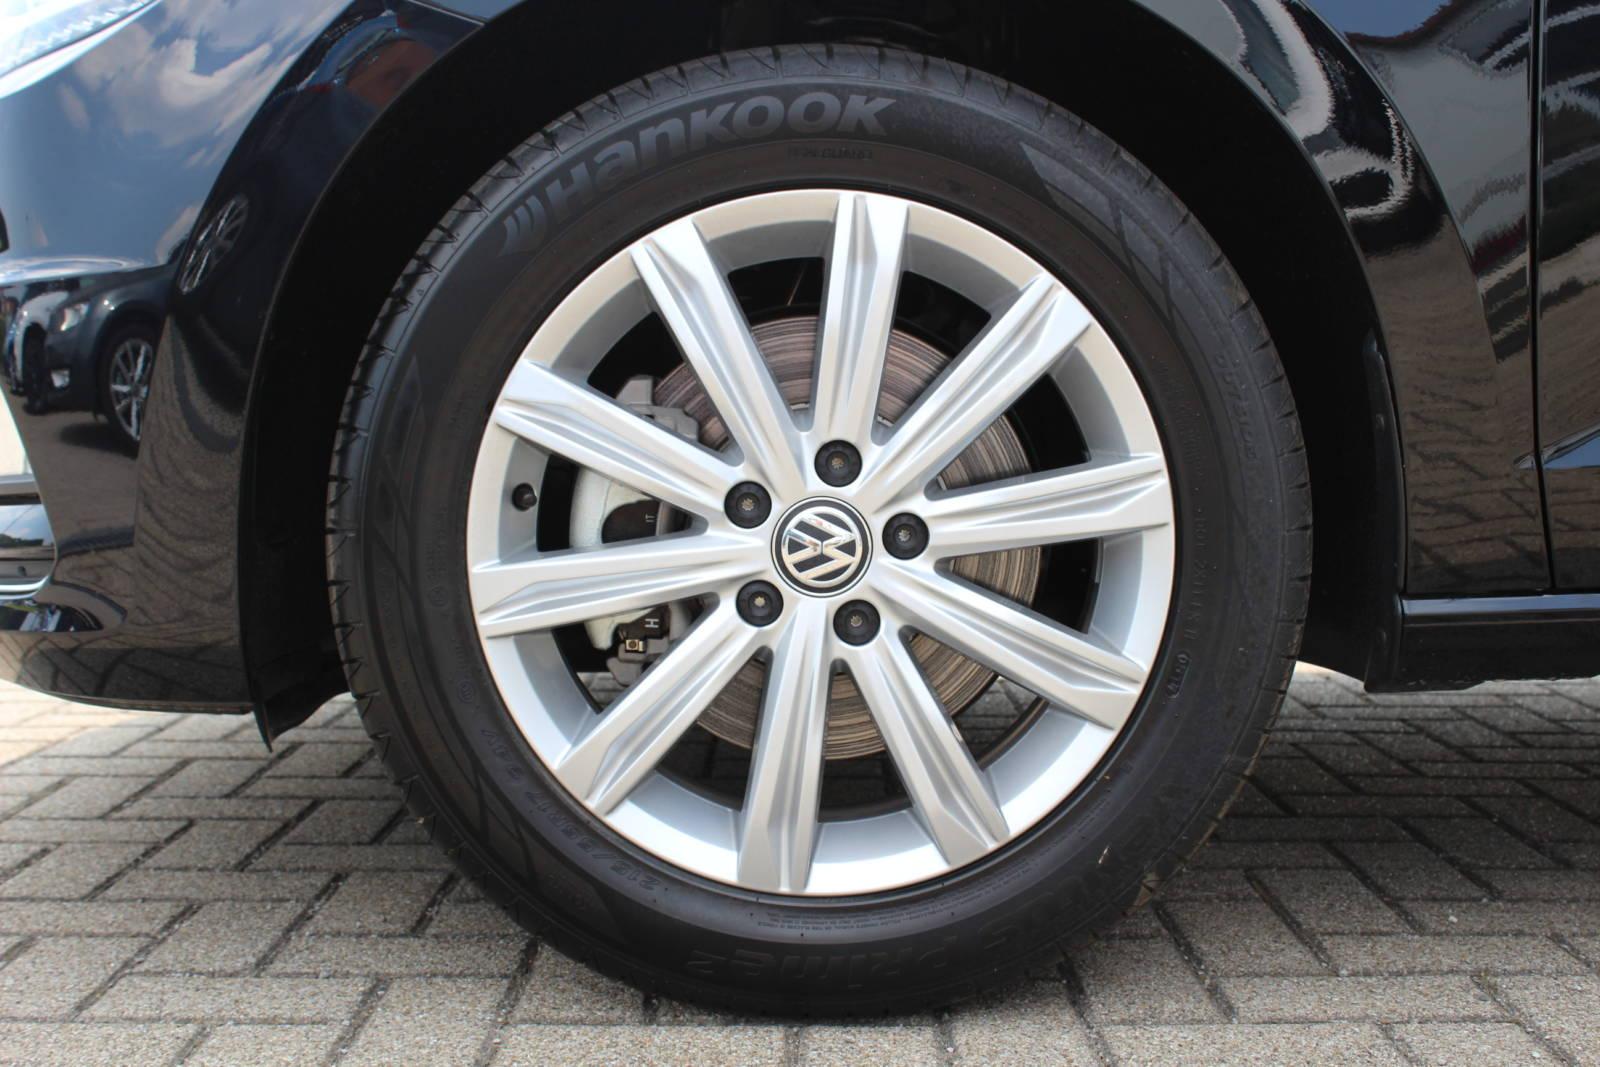 VW Touran Highline 1.4 TSI 6-Gang / Deutsche Neufahrzeuge und EU-Neufahrzeuge – Aha! Fahrzeughandel GmbH in Althengstett